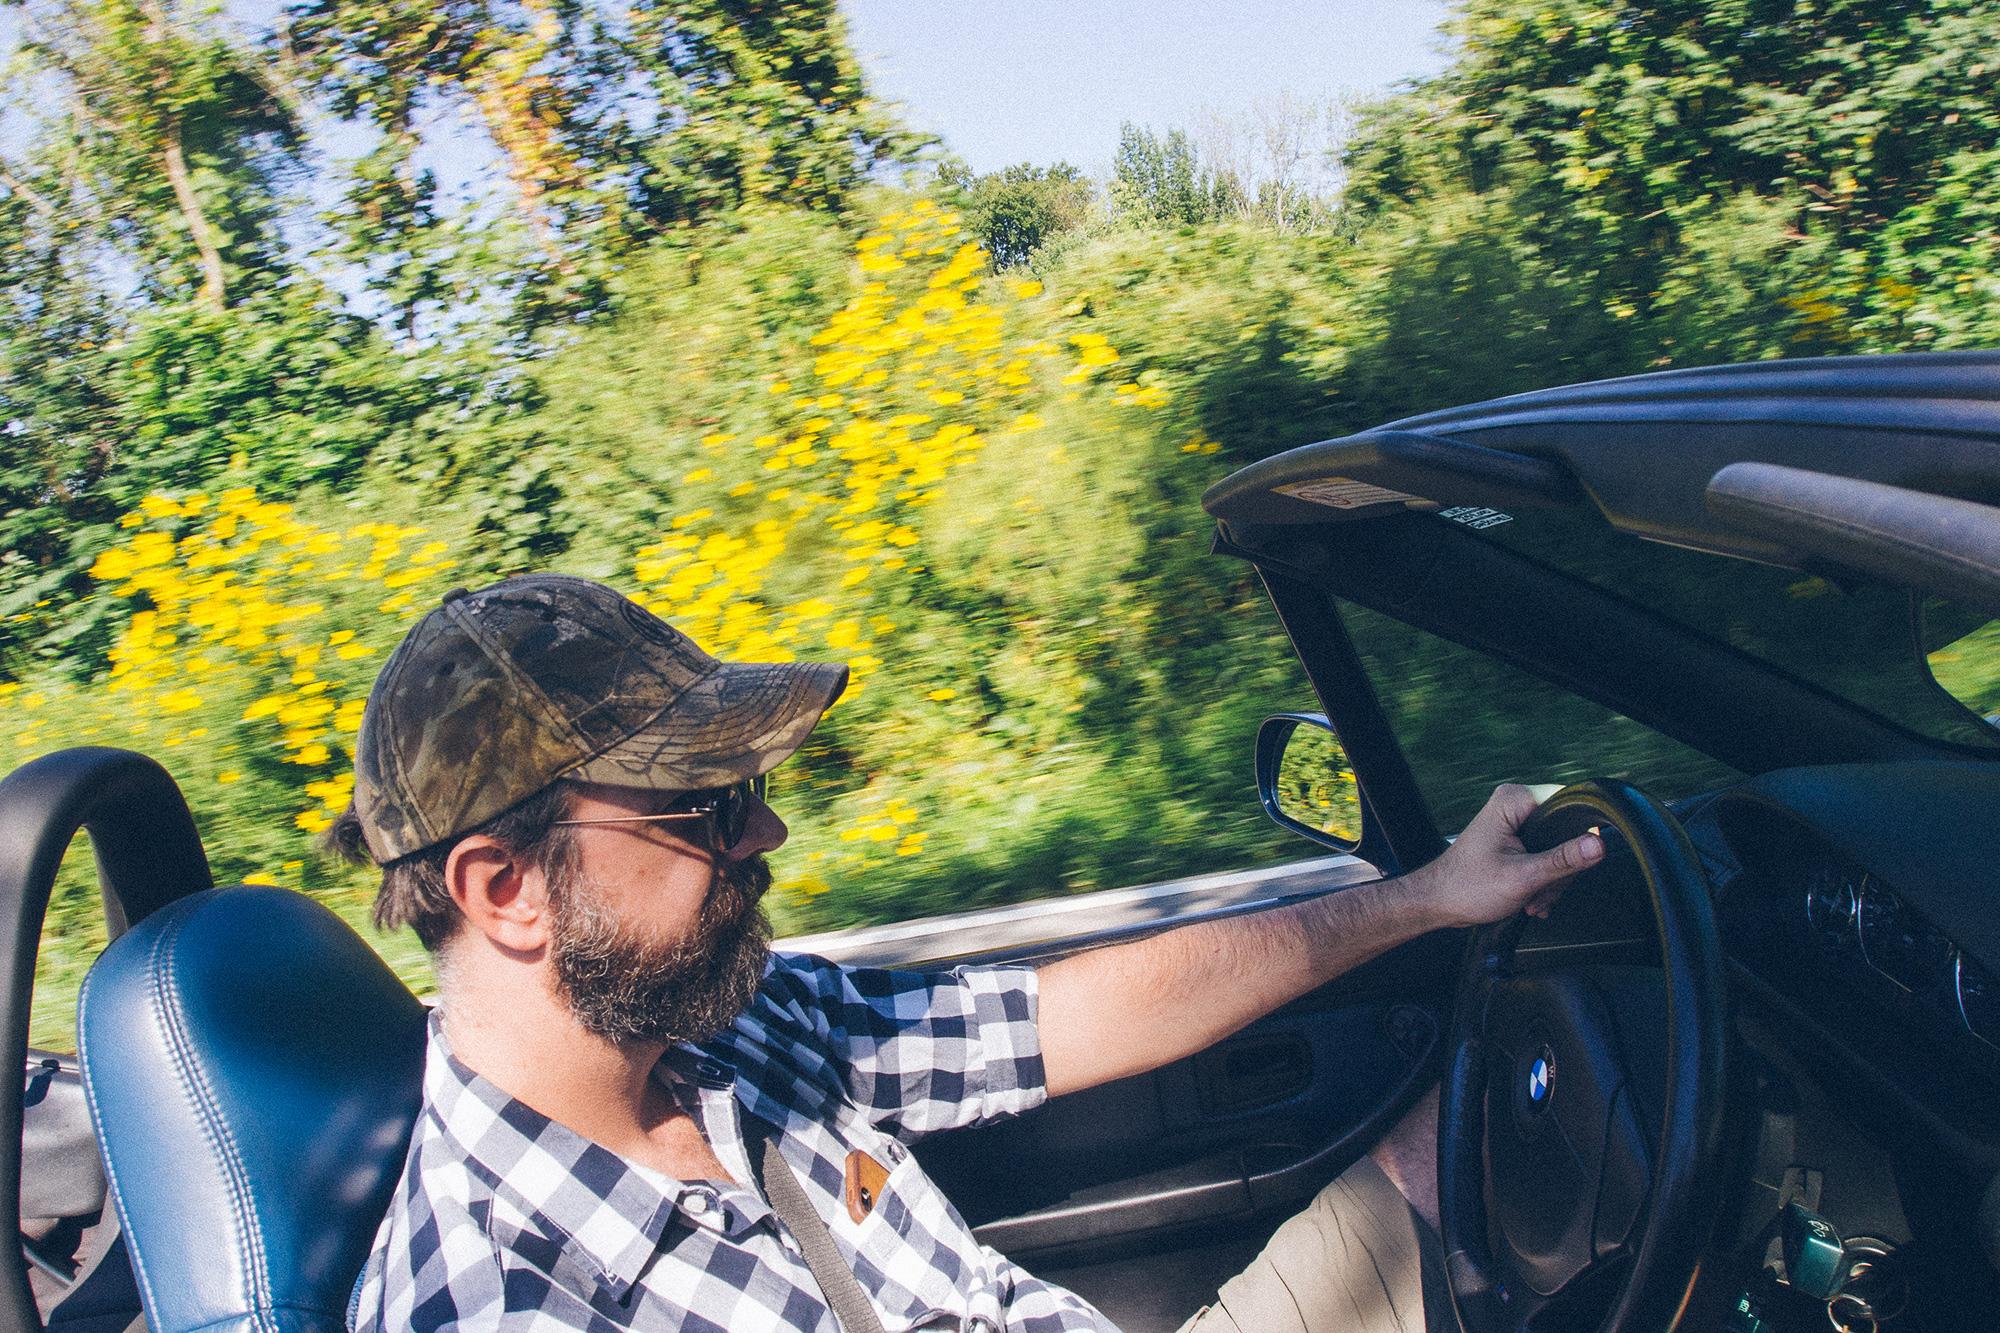 A man driving a convertible